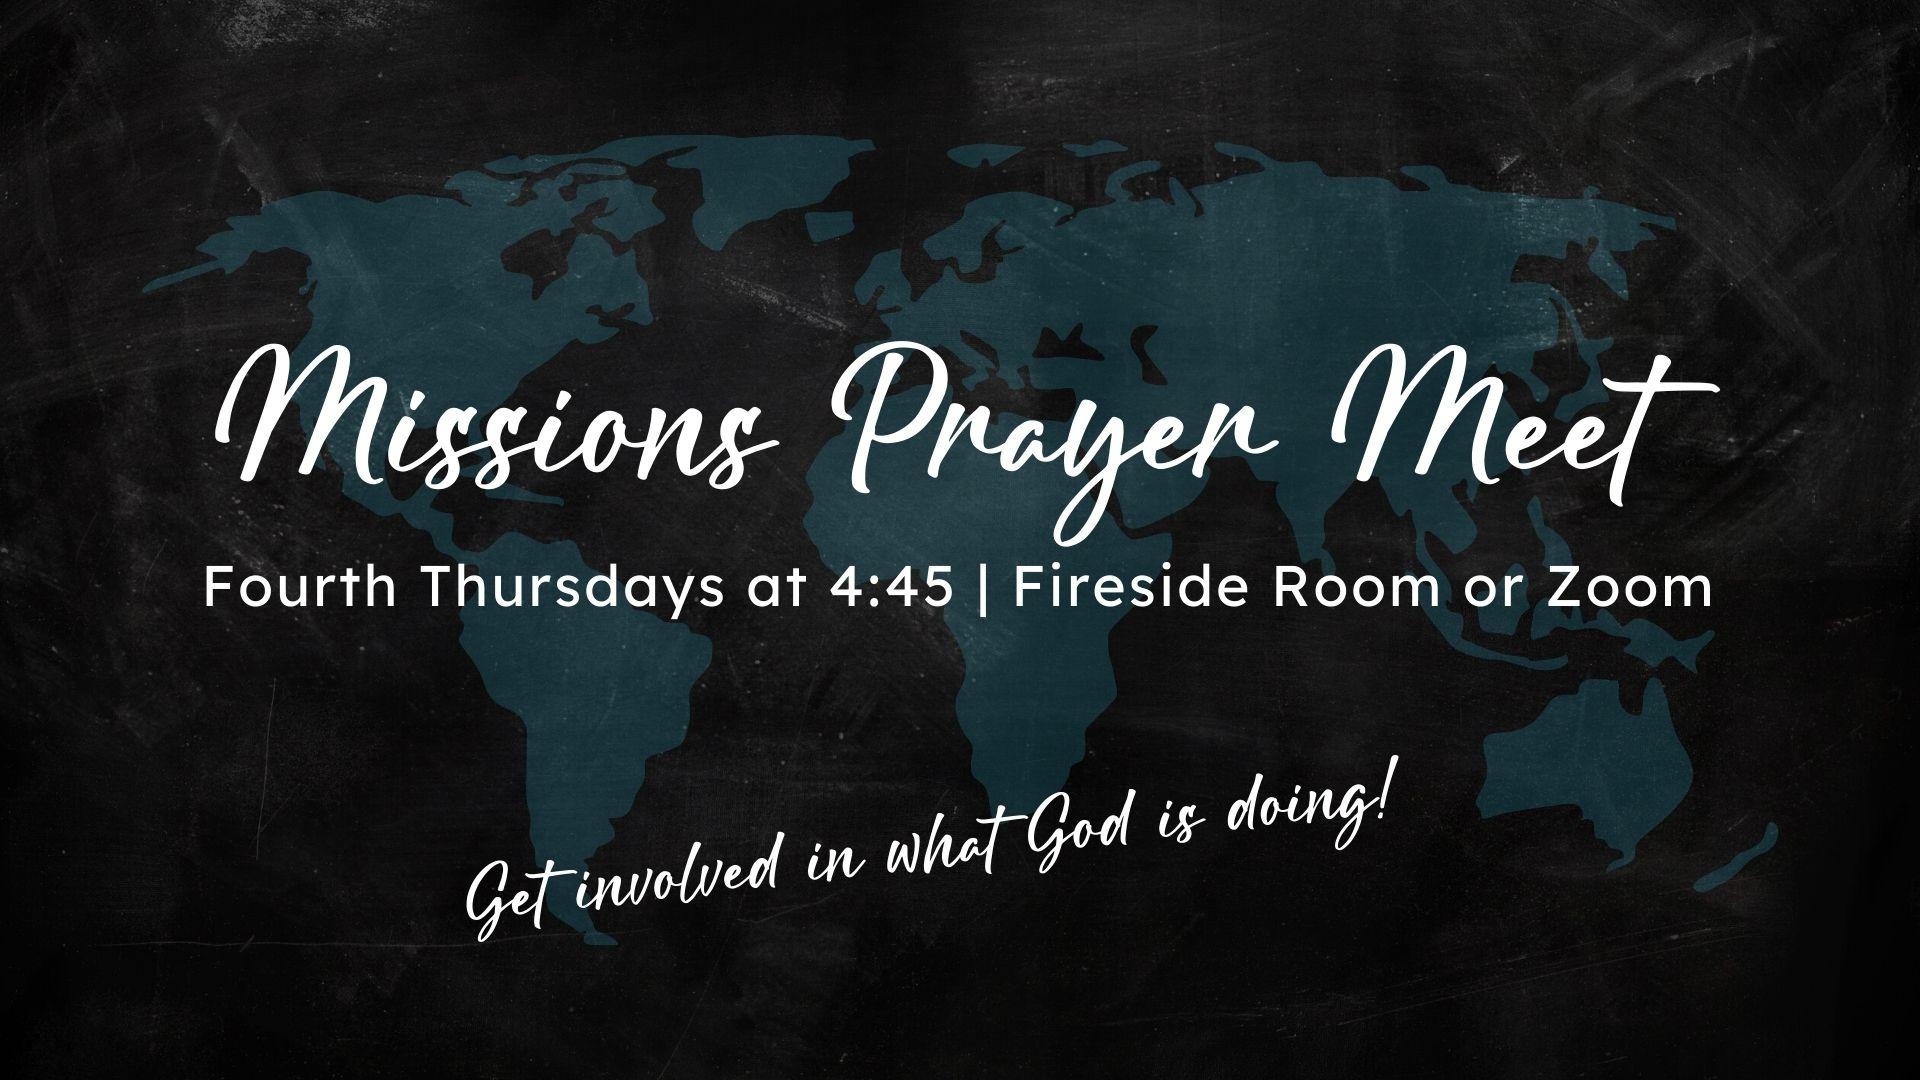 Missions Prayer Meet (9)